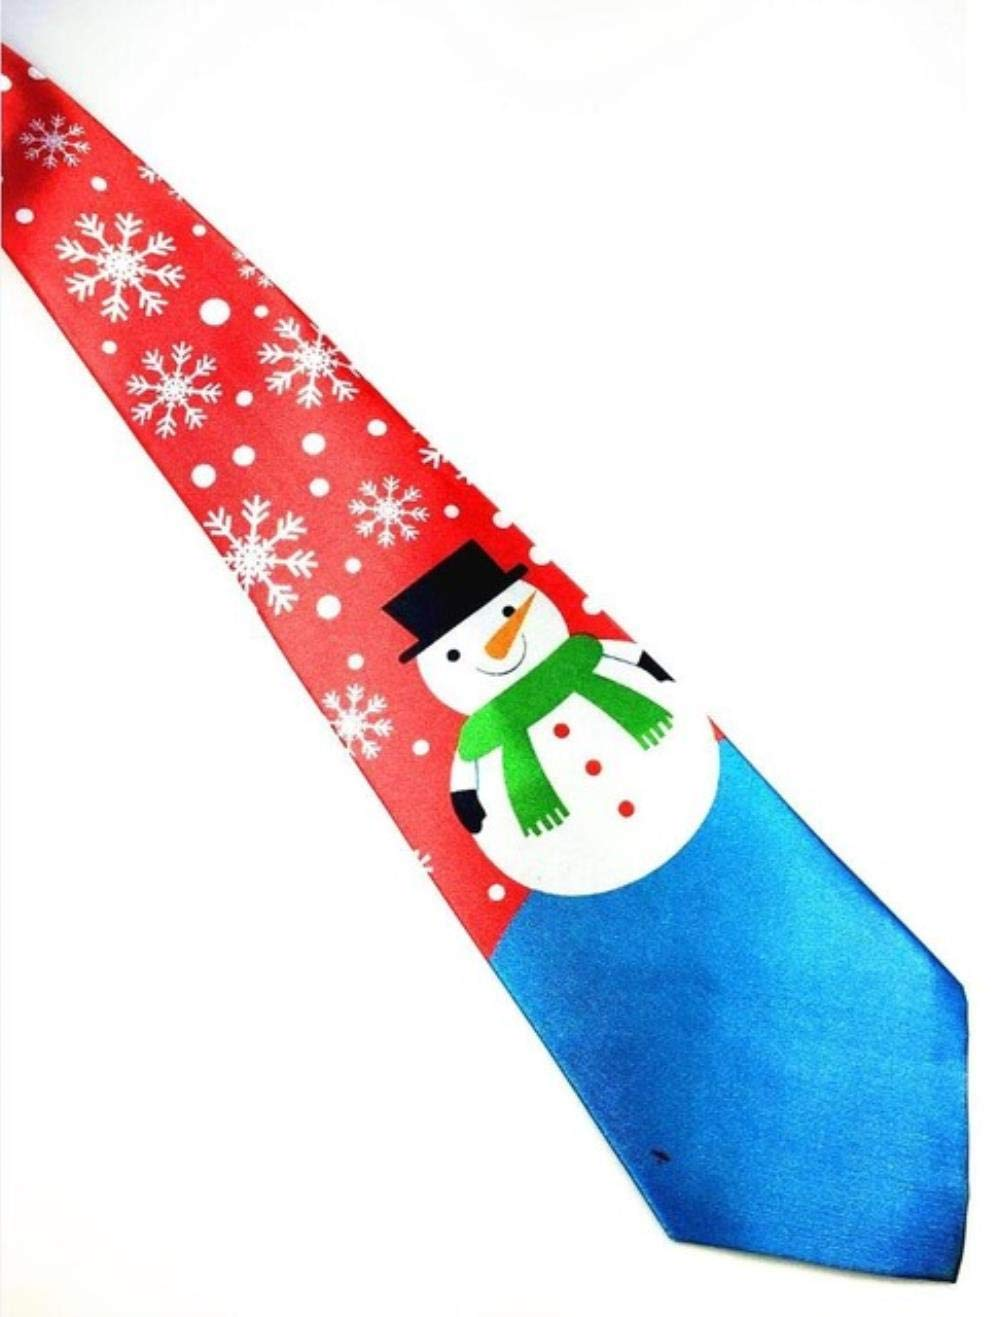 PAIZEP Corbata de Navidad Estilo de 9.5 cm Corbatas de Moda para ...